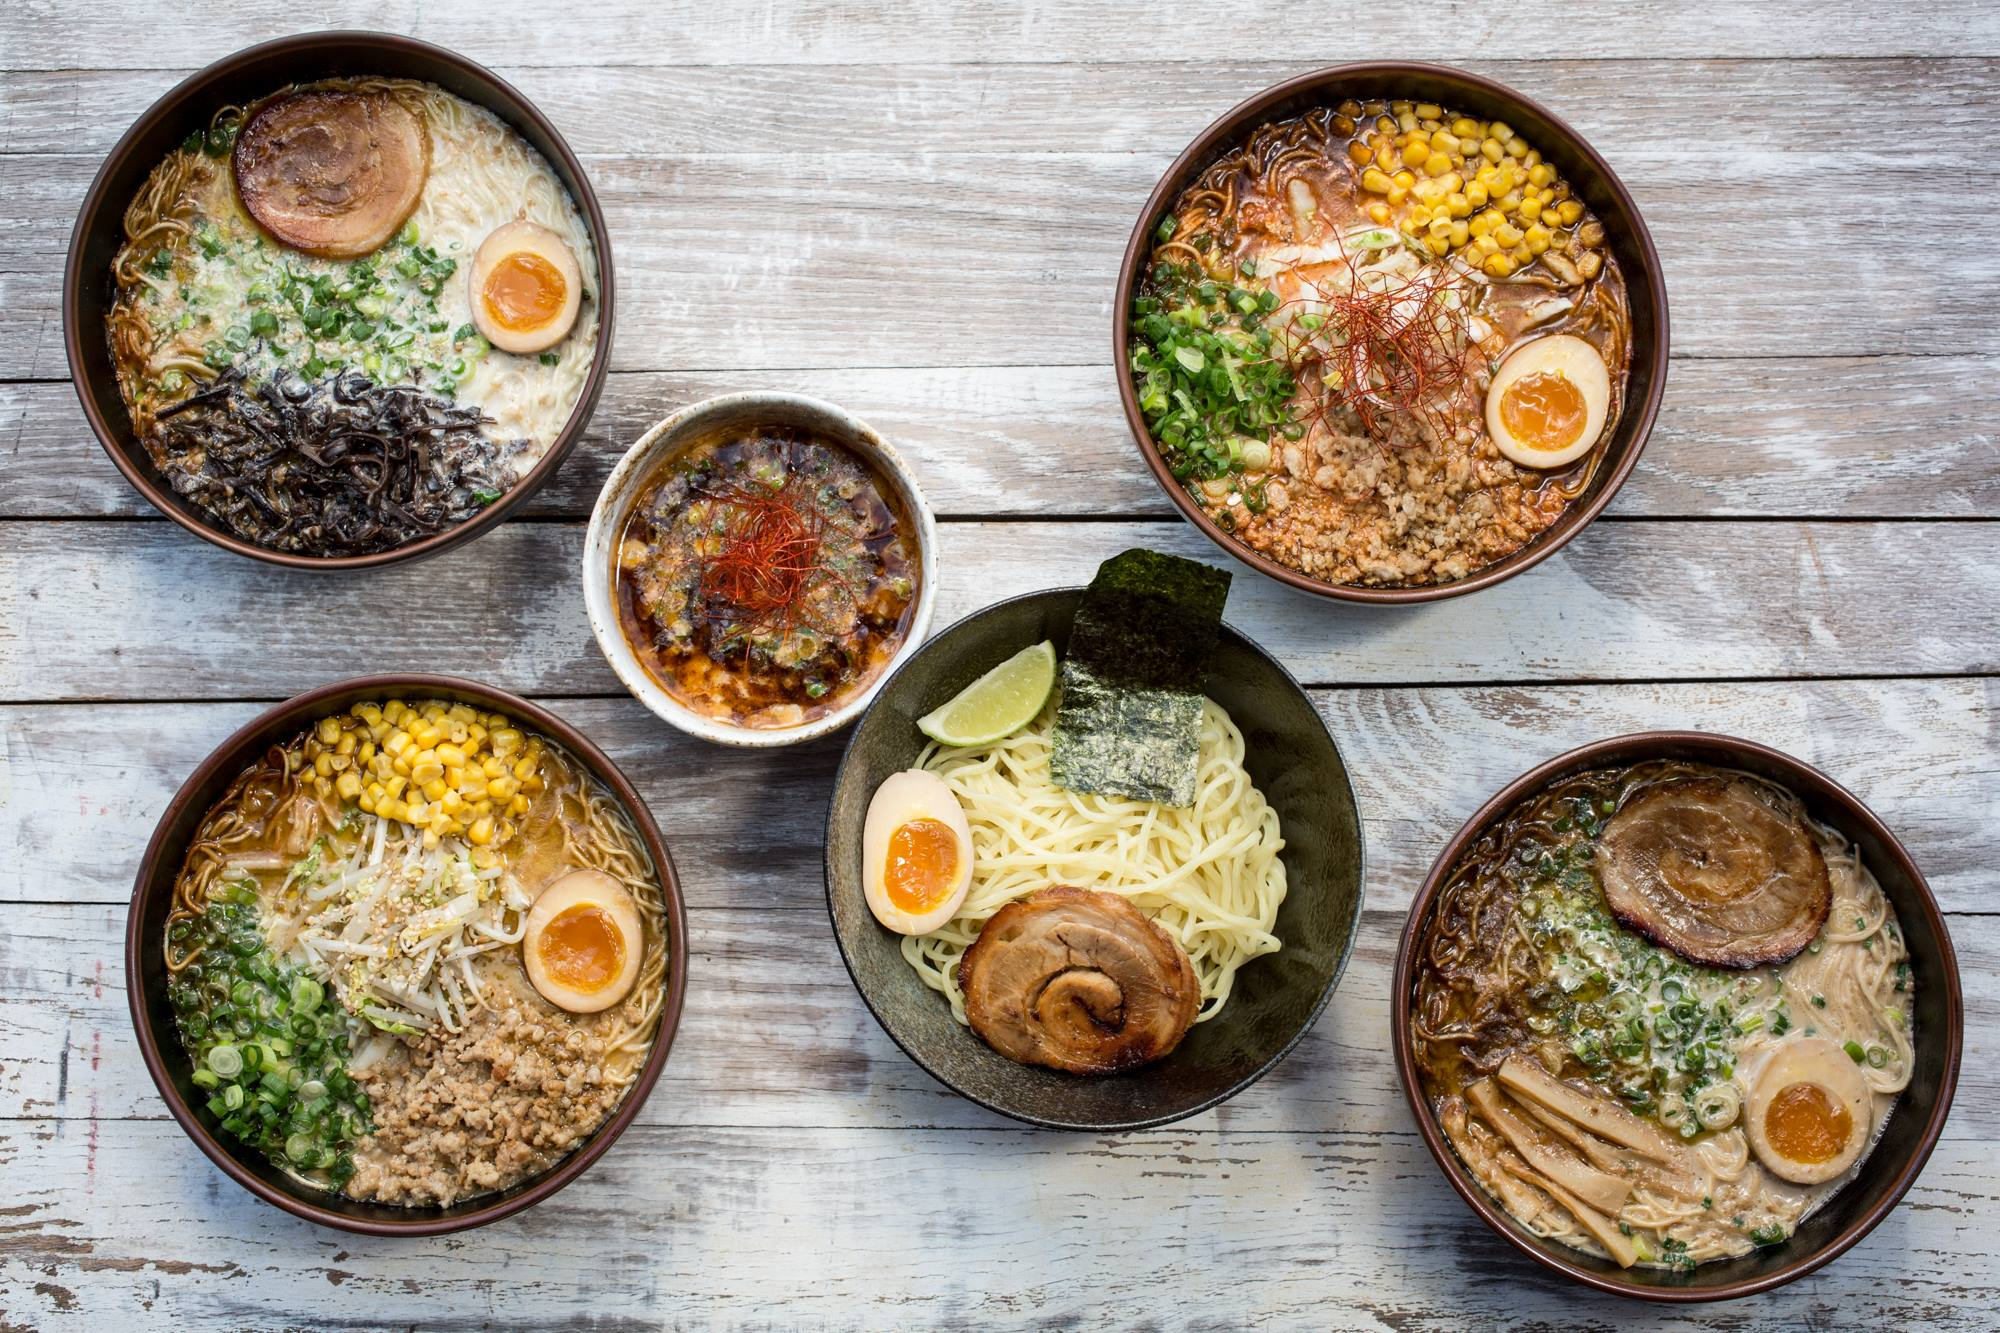 Ramen Tatsu-ya's ramen and more